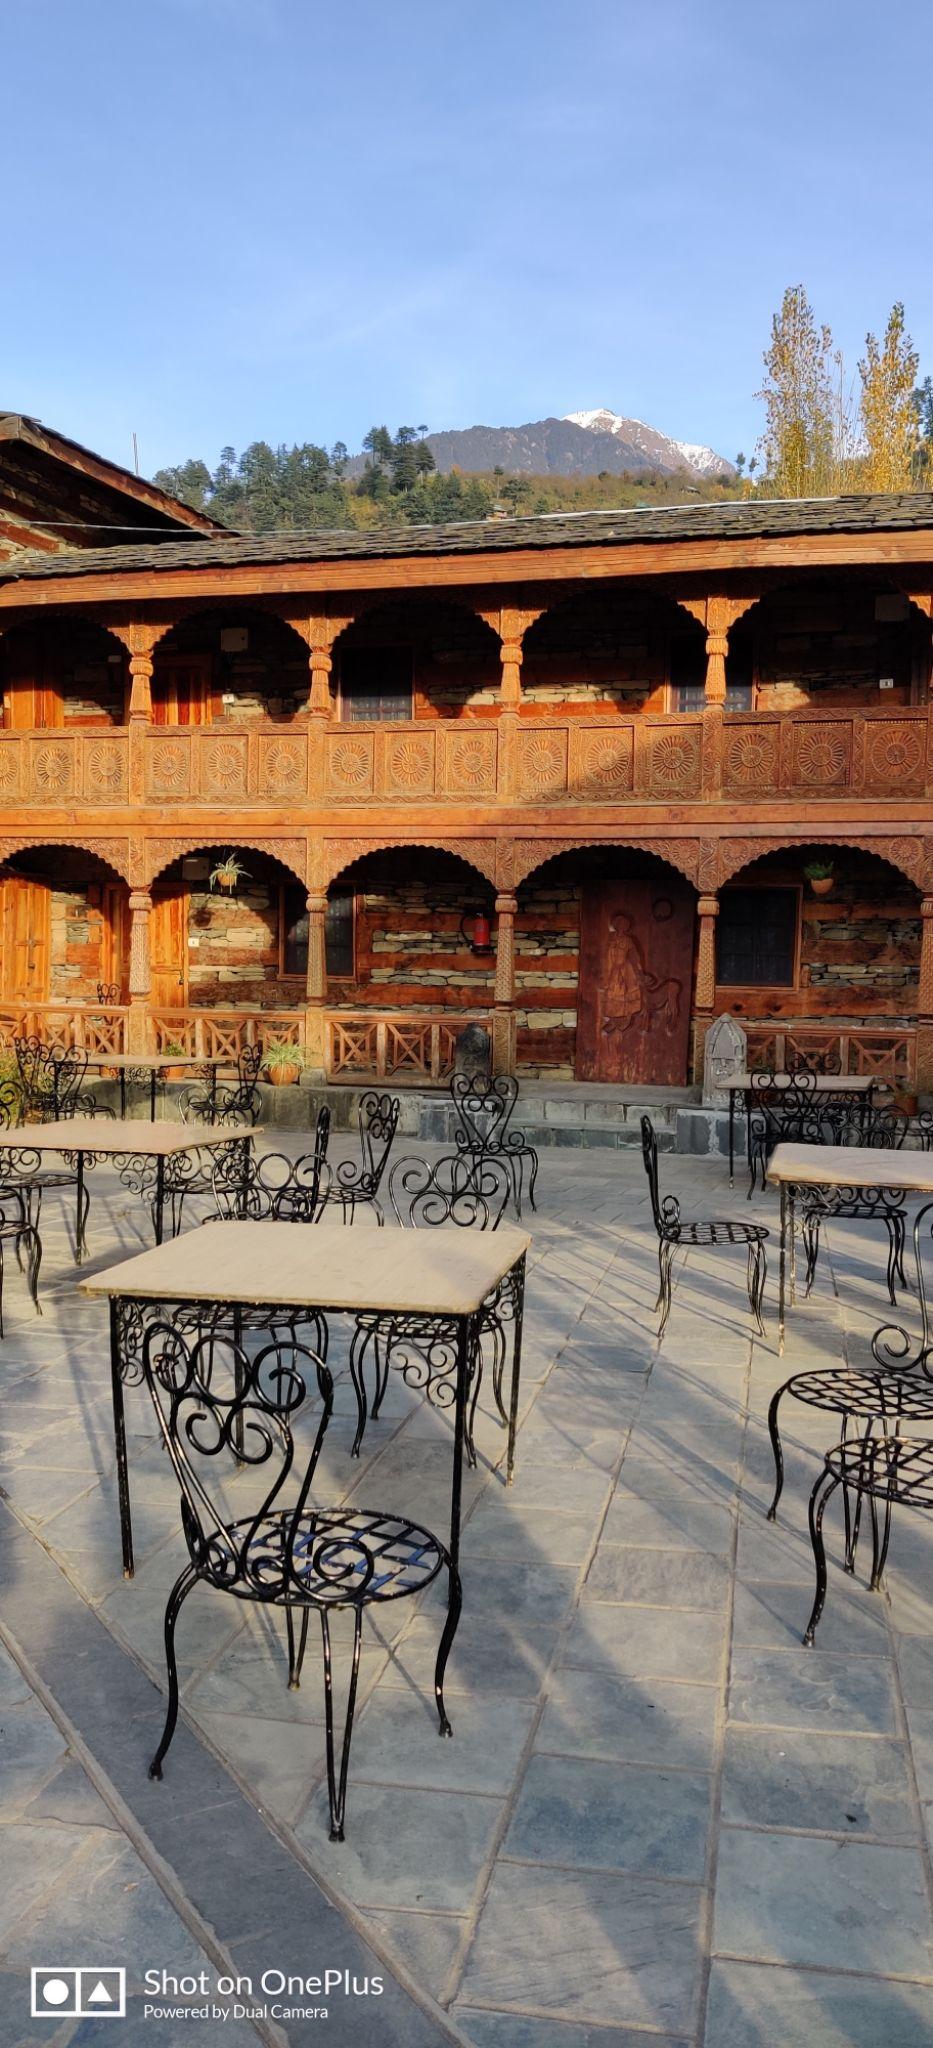 Photo of Naggar Castle & Hotel Naggar Castle By Bhuwan Bhandari